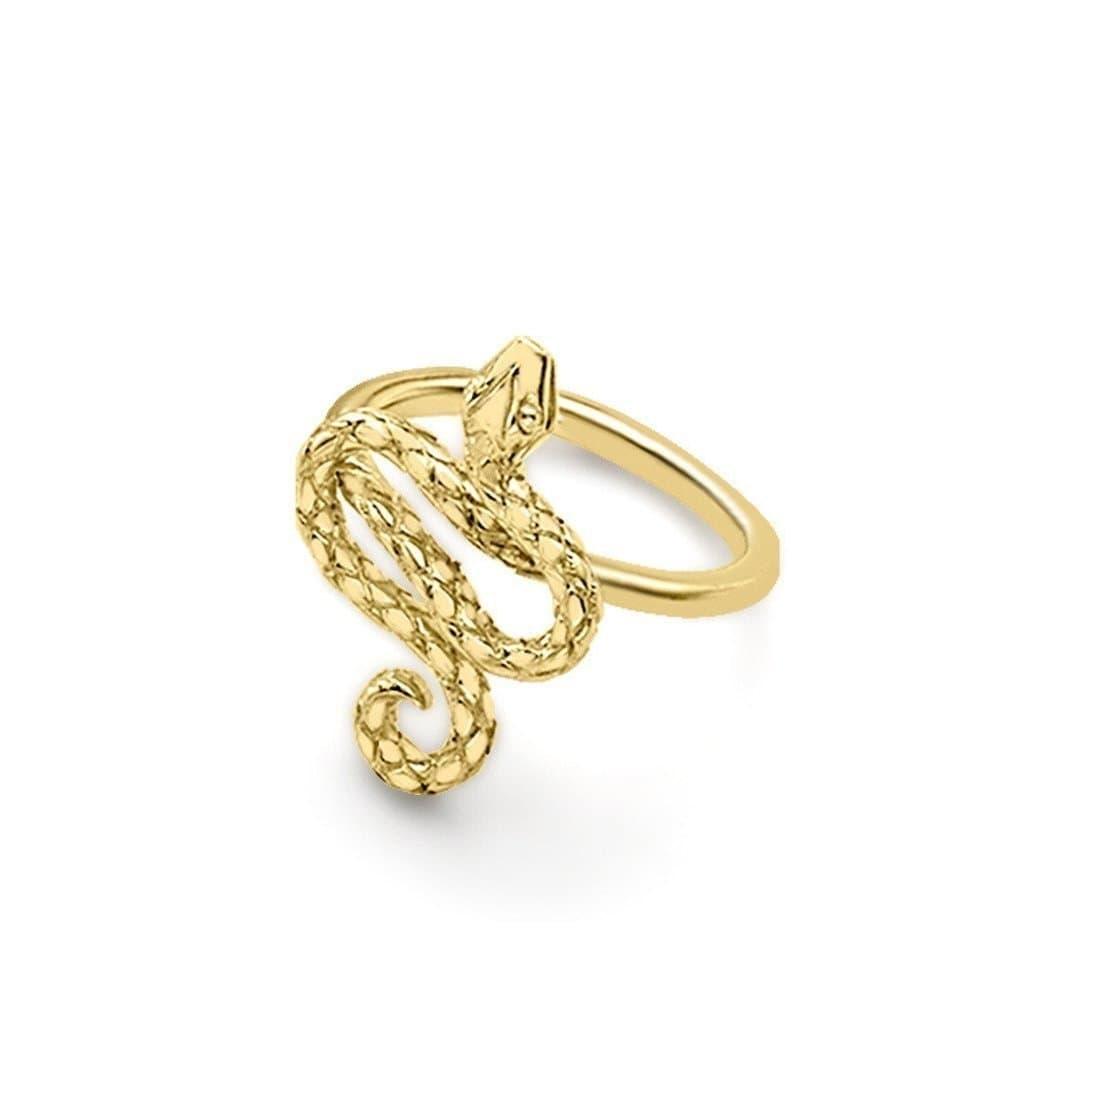 Kew Serpent Yellow Gold Ring